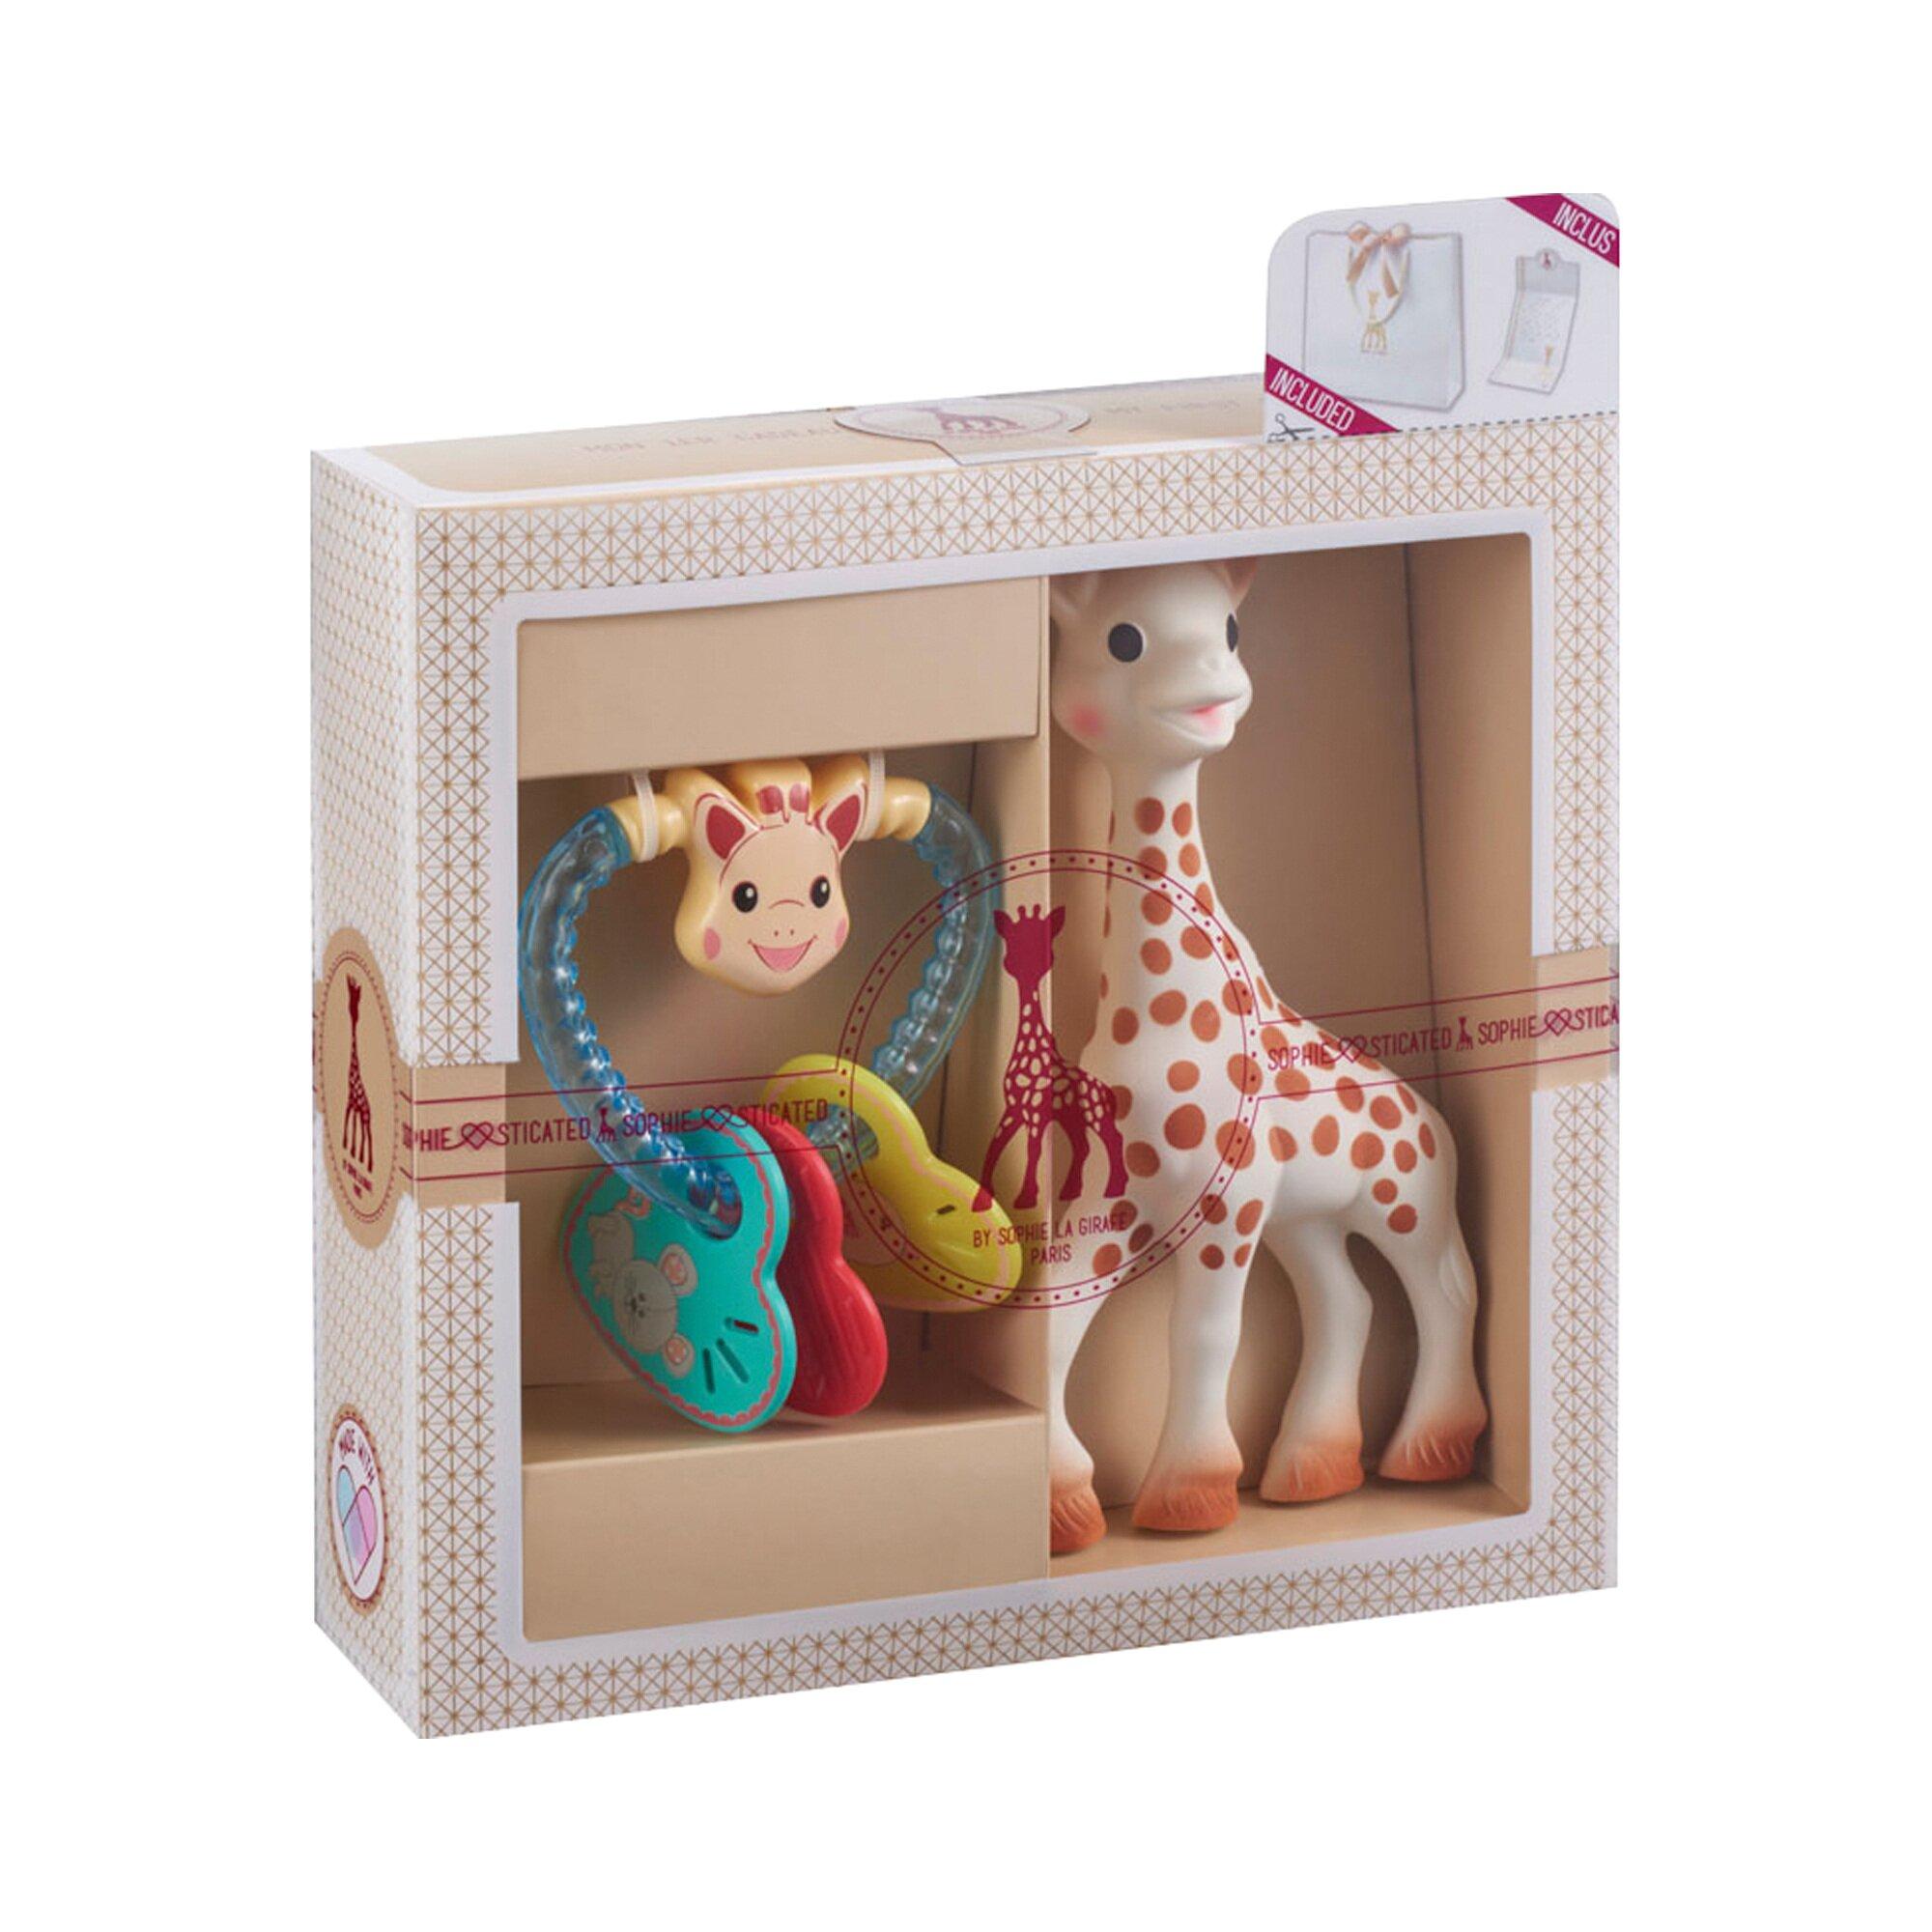 sophie-la-girafe-geschenk-set-sophie-la-girafe-herzrassel